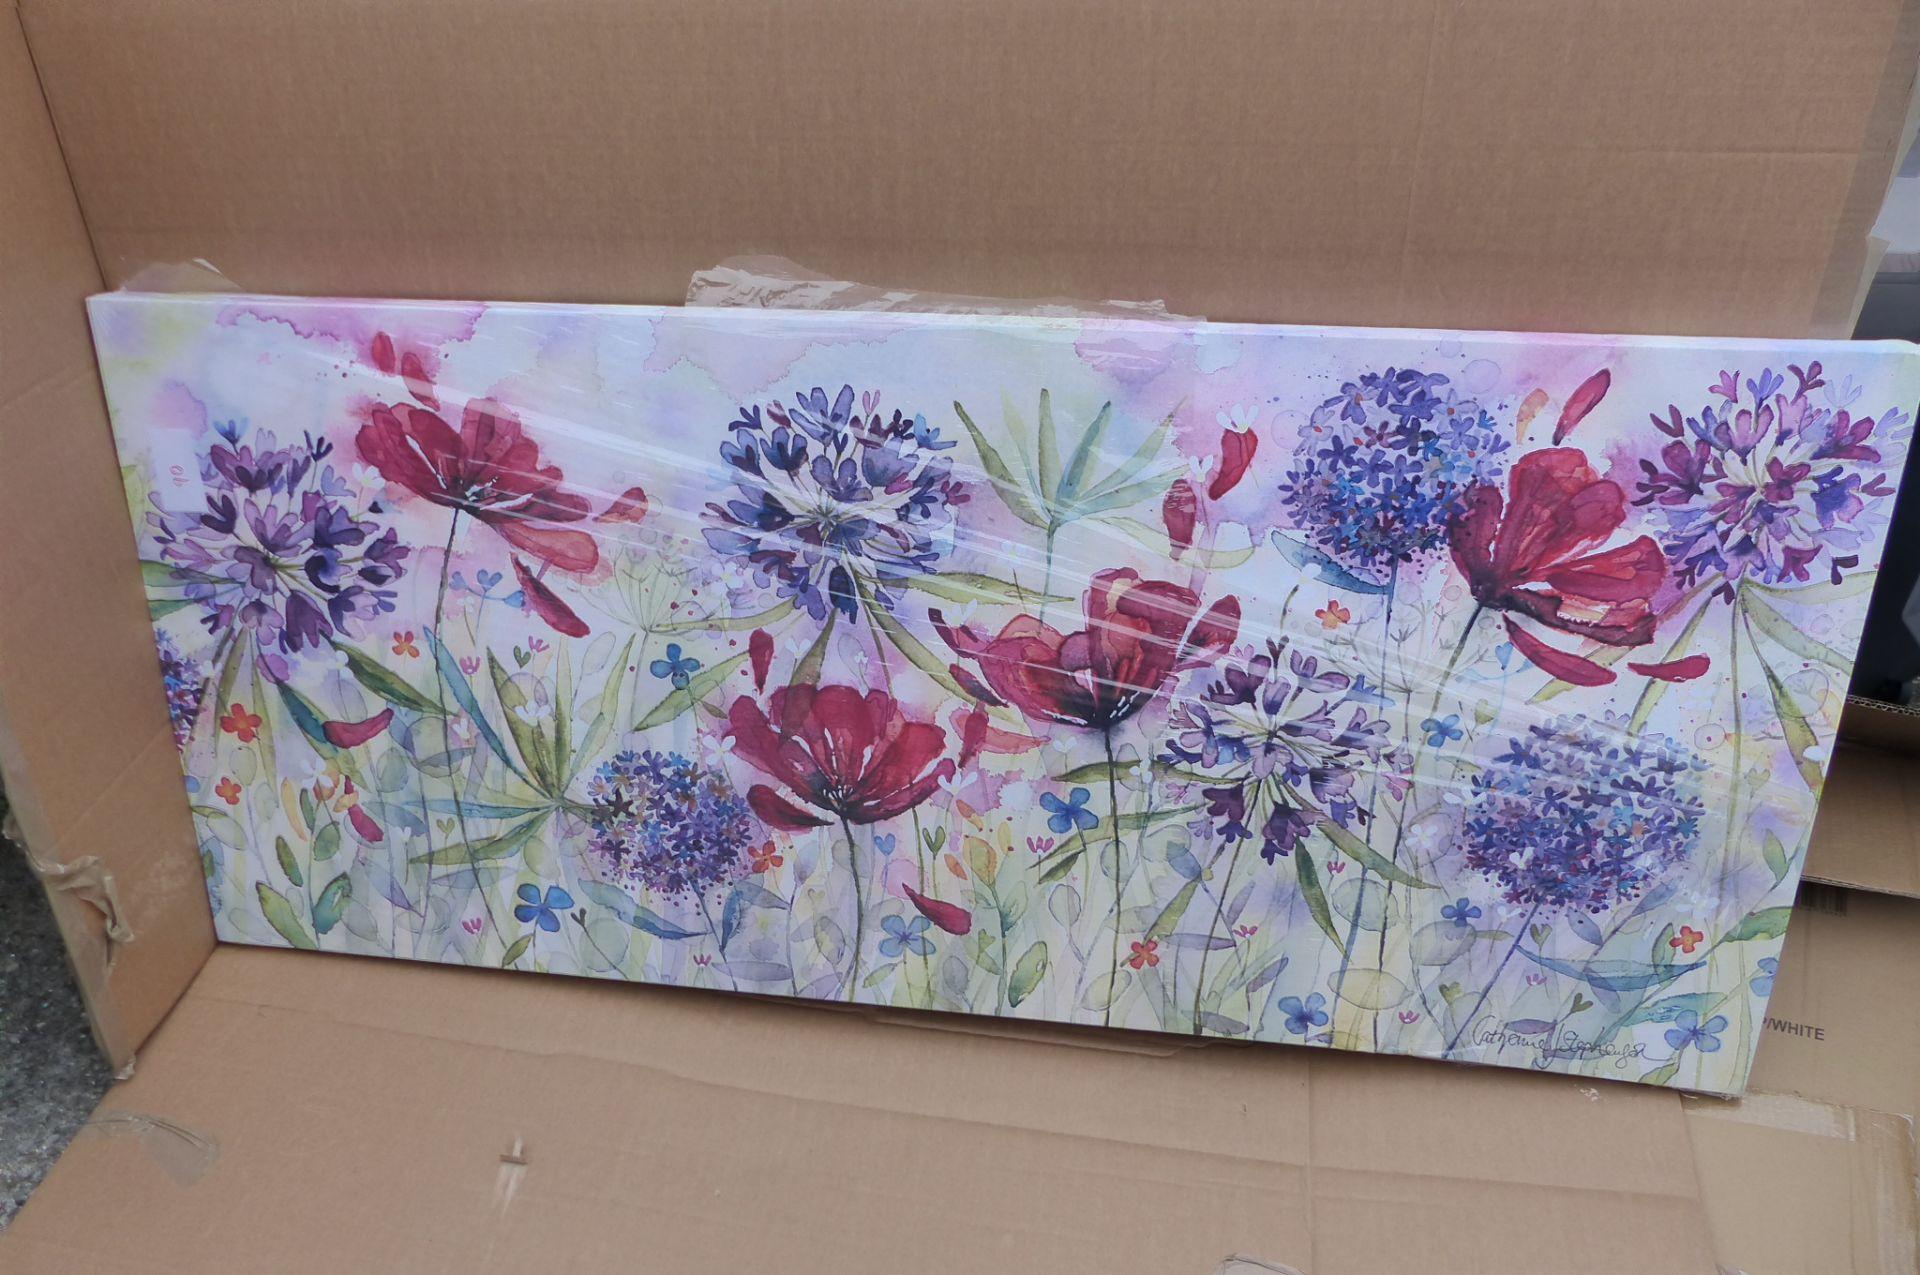 Catherine Stephenson - Blooming Summer Print, 135 x 60cm